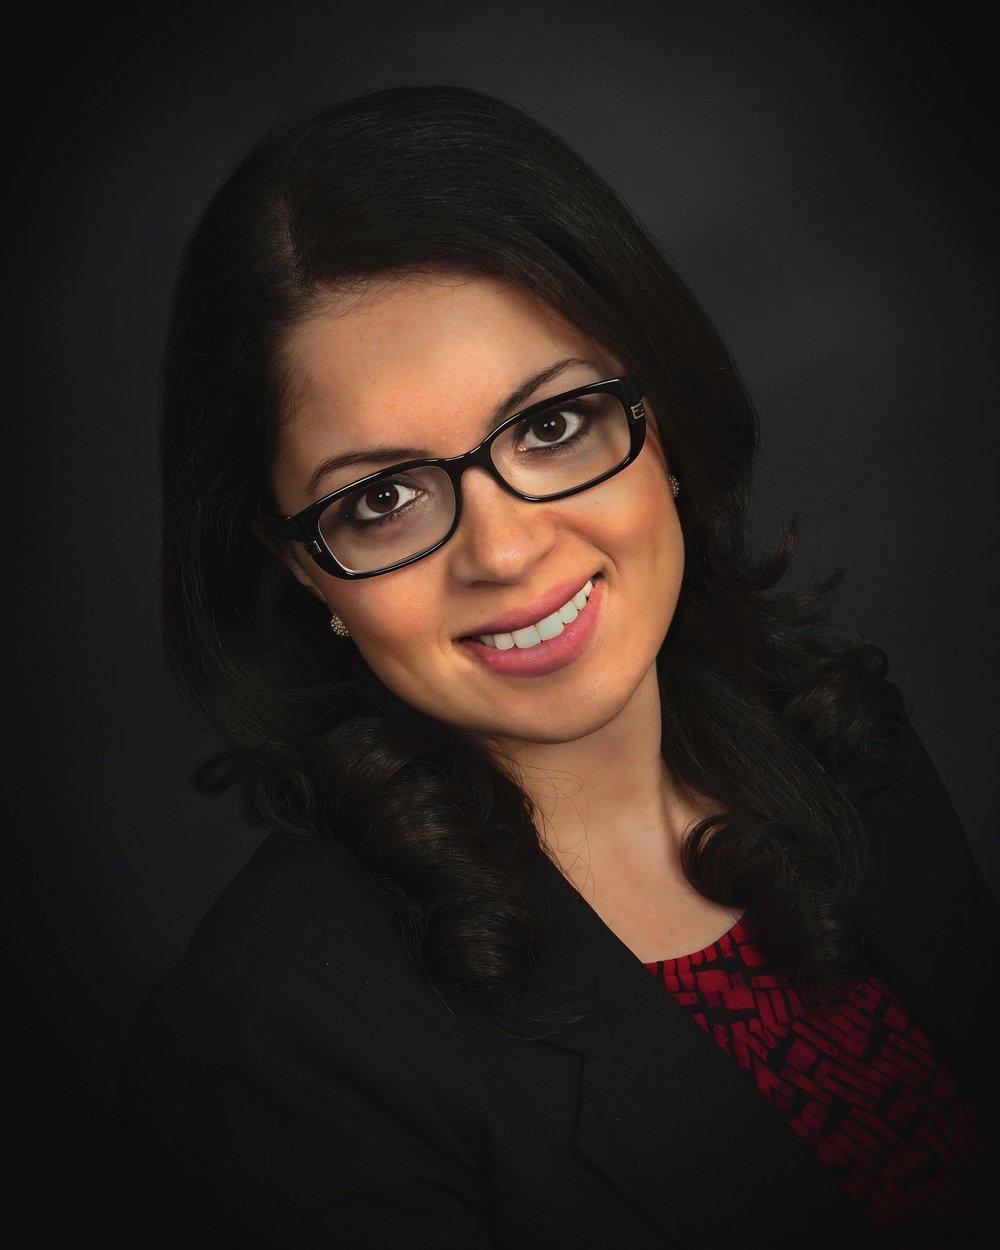 Farah Al-Khersan